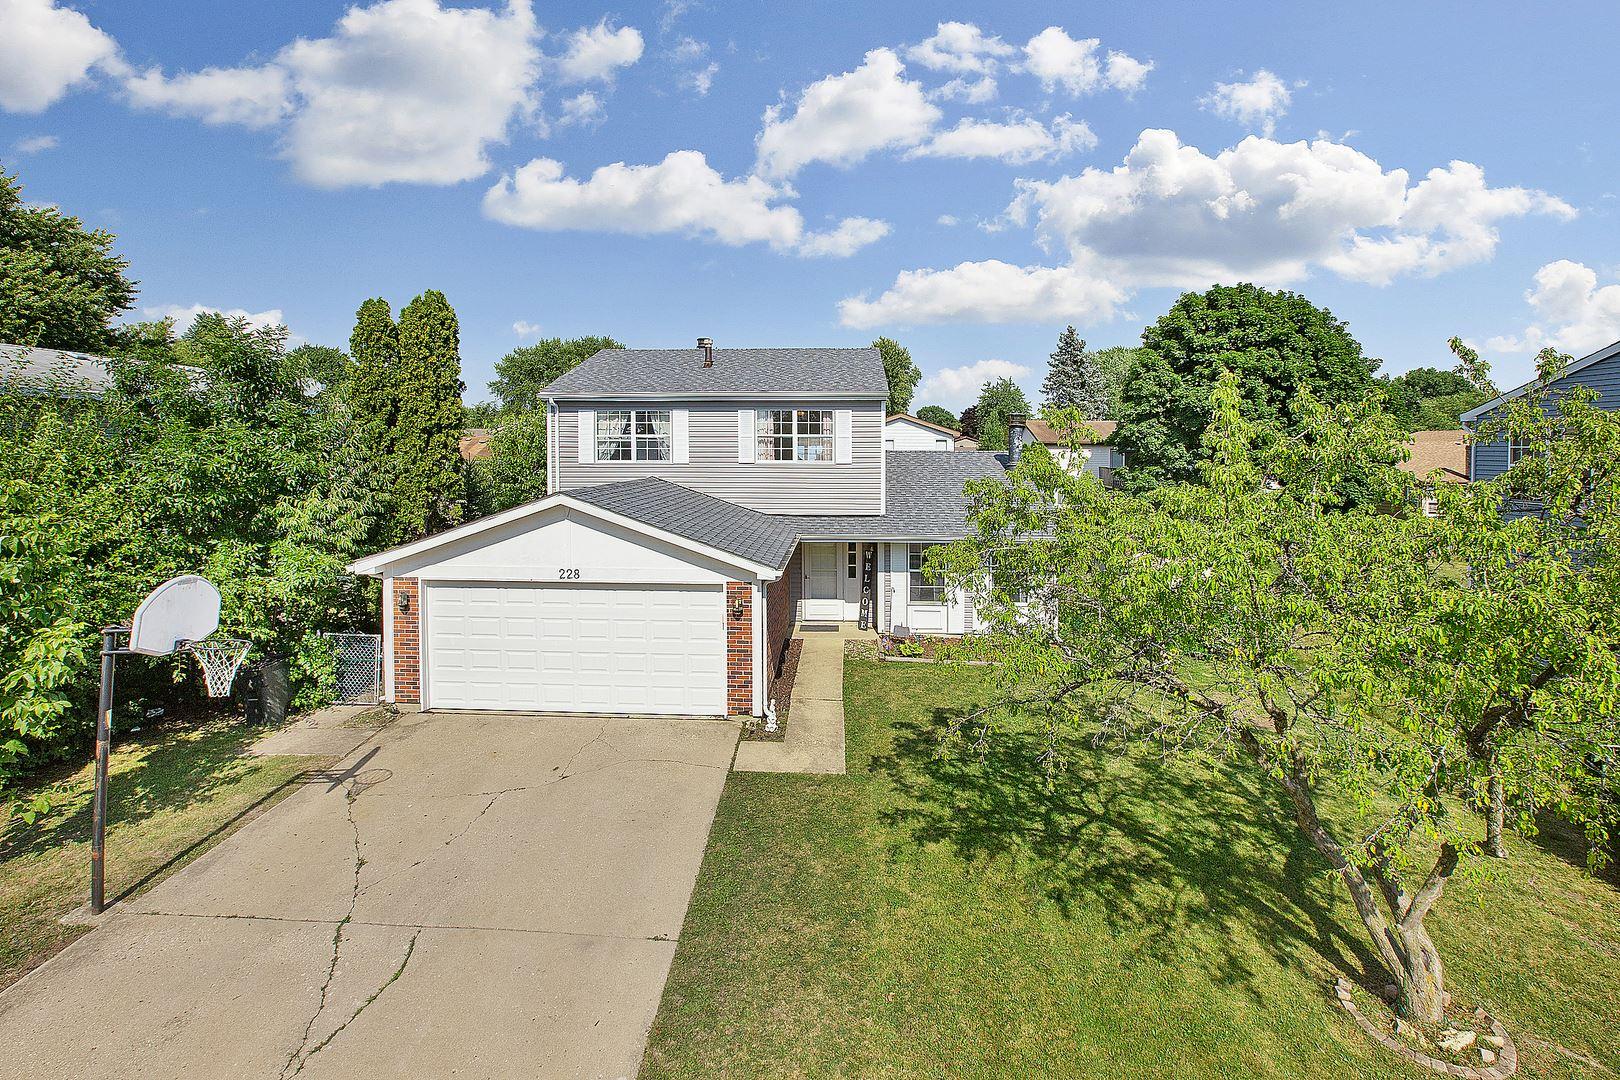 Photo of 228 YELLOW PINE Drive, Bolingbrook, IL 60440 (MLS # 10910776)